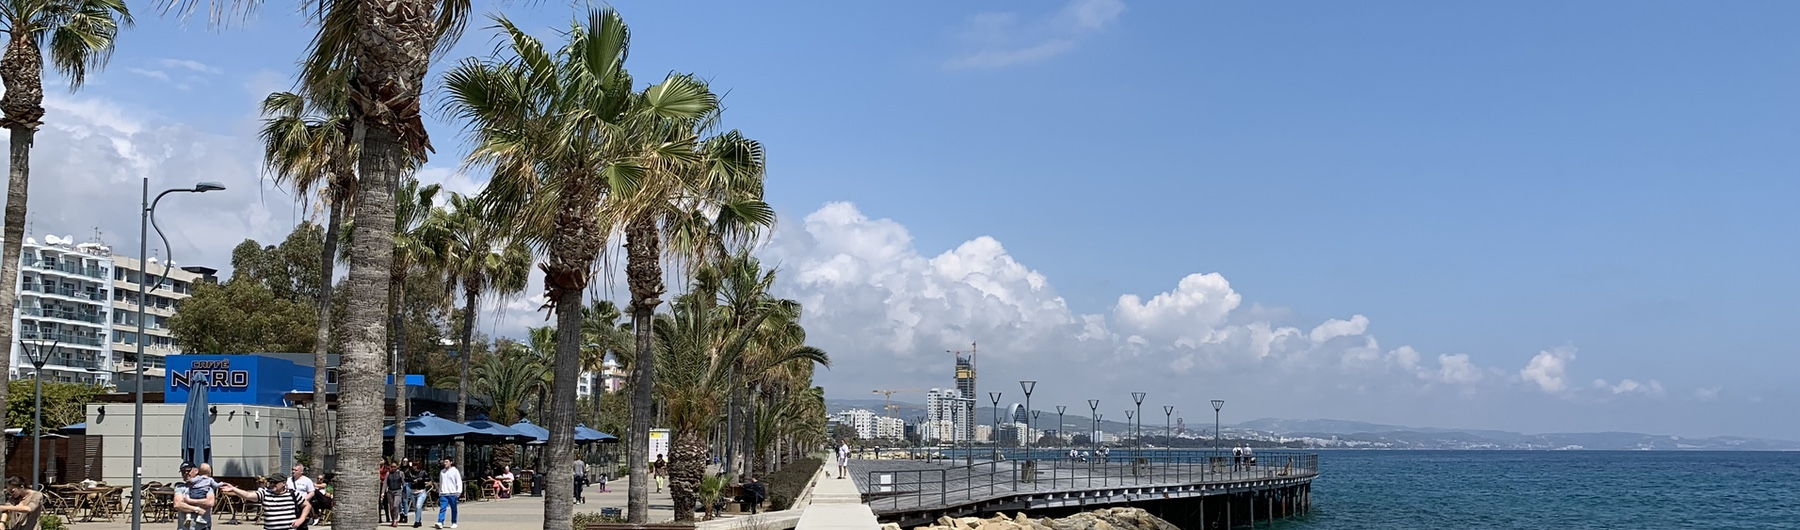 CyprusJS Limassol Meetup #2